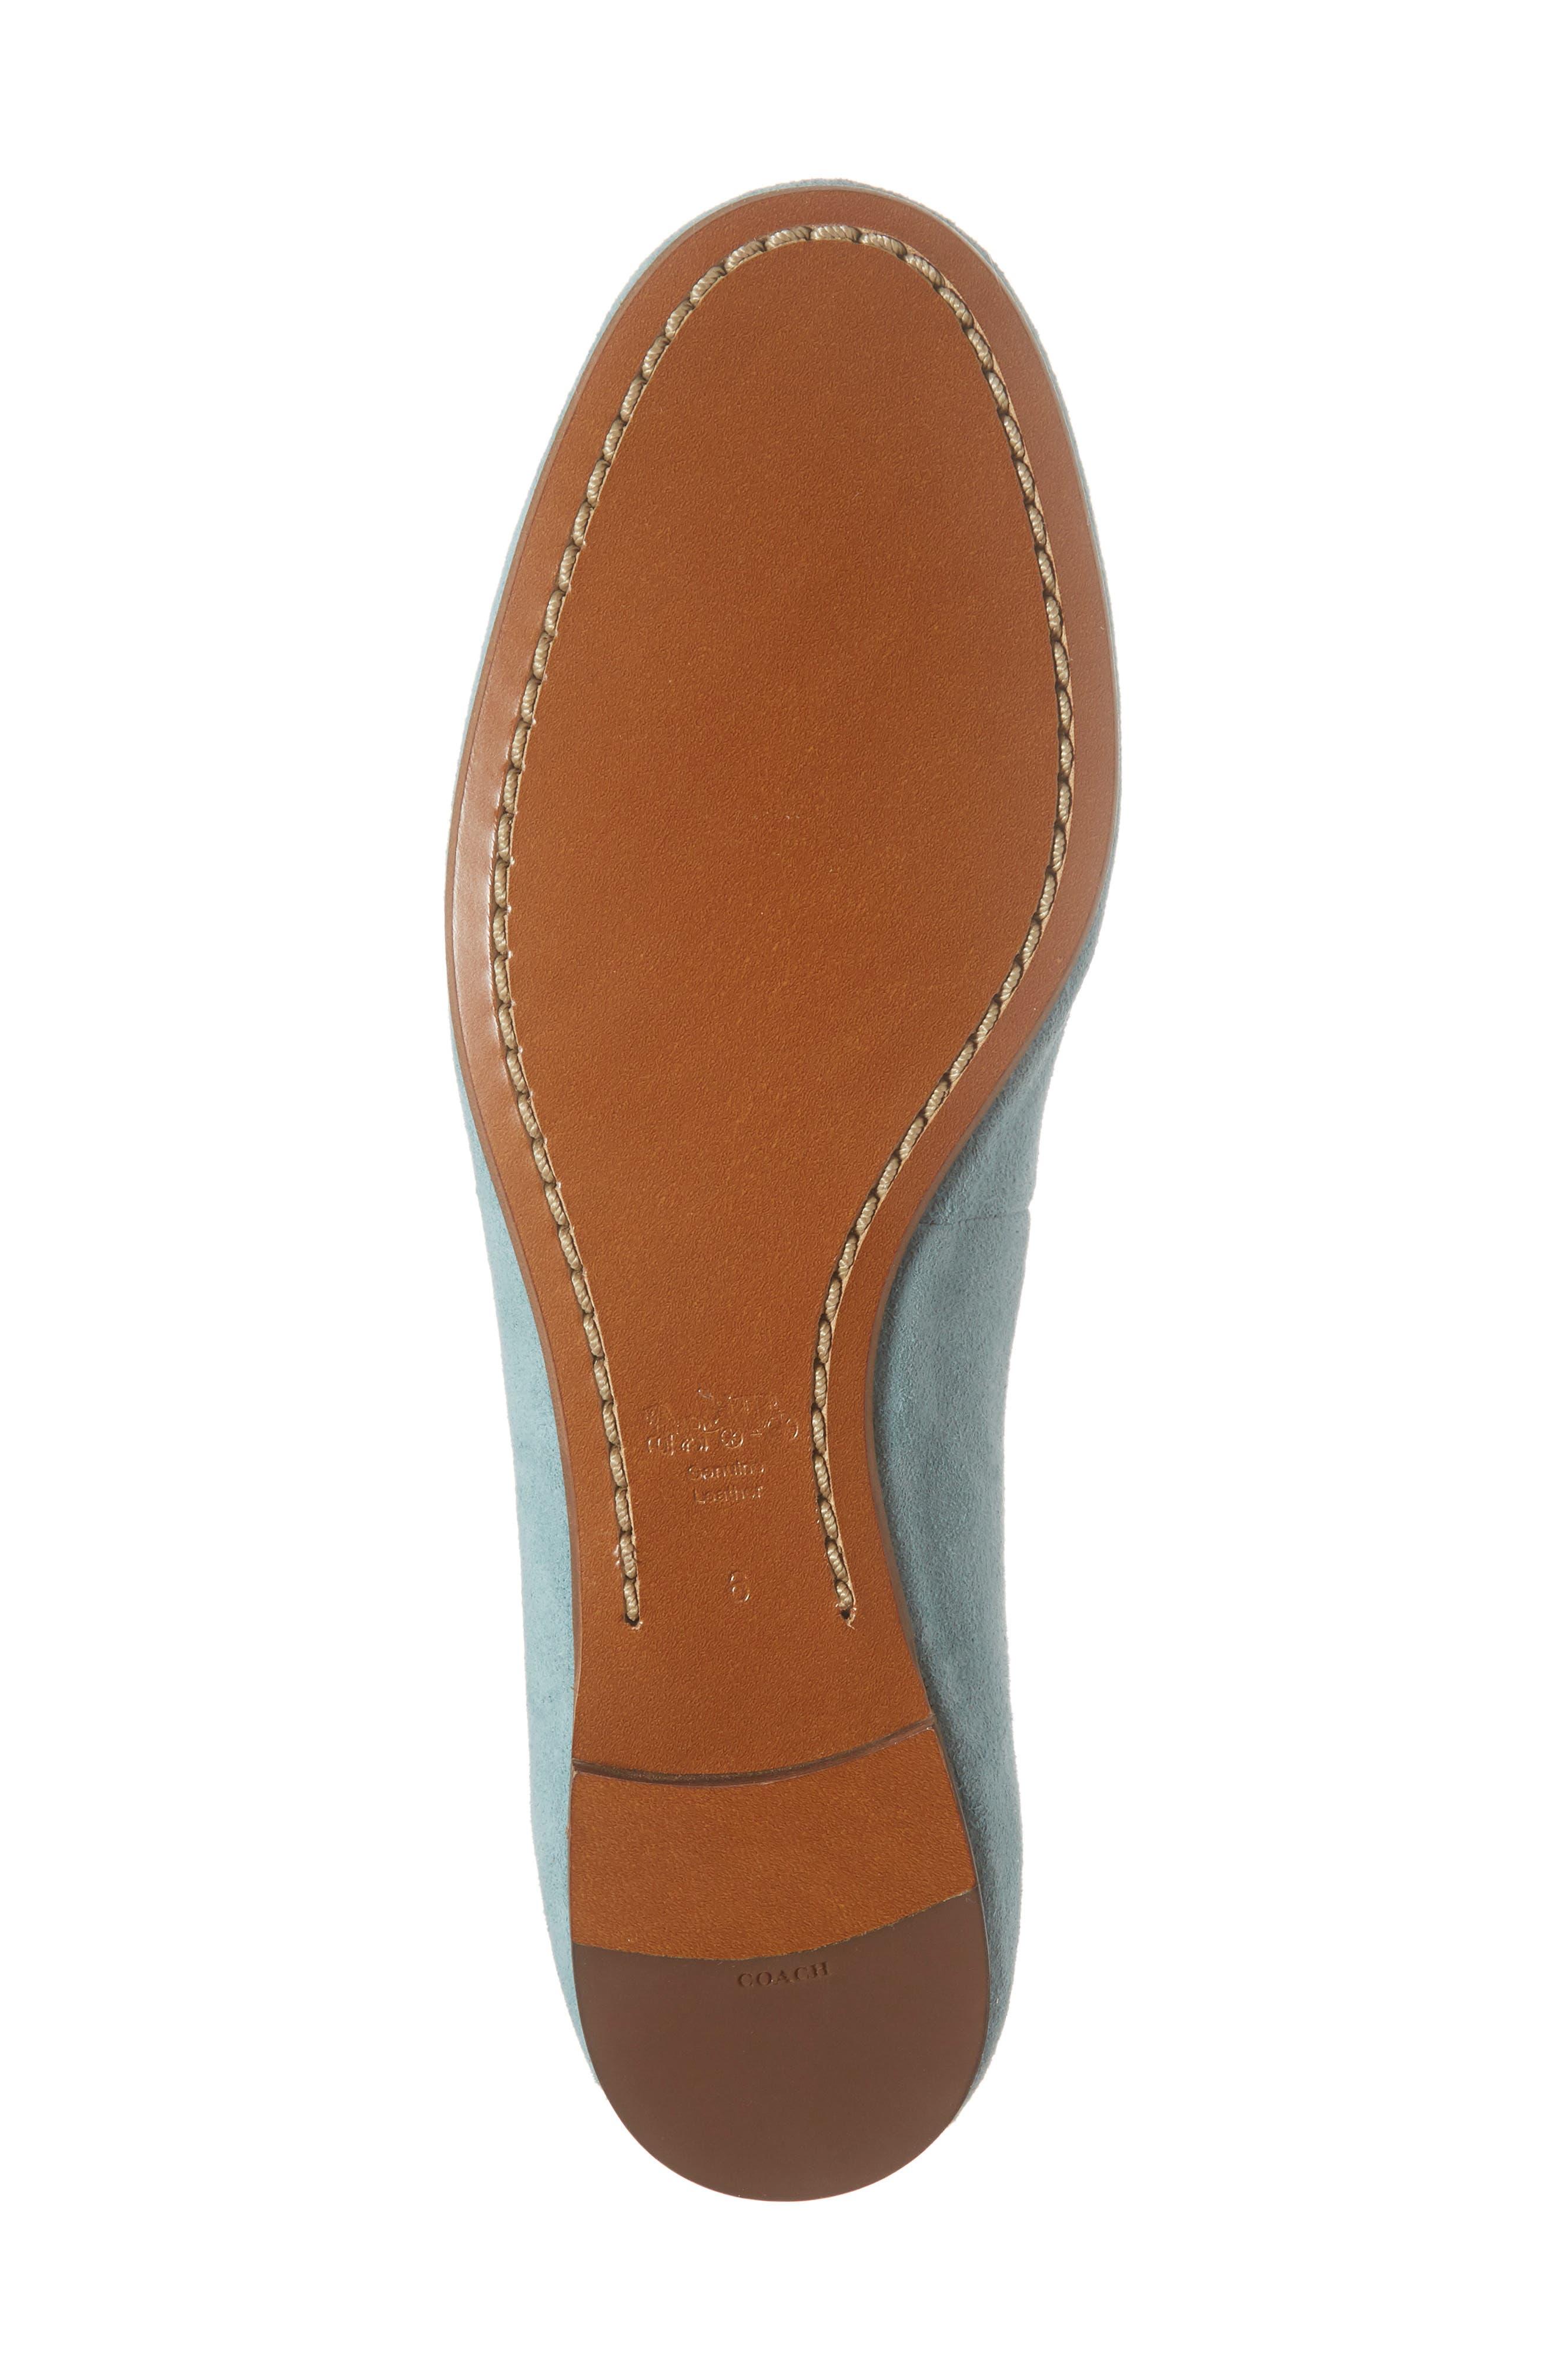 Lola Ballet Flat,                             Alternate thumbnail 6, color,                             Marine Leather